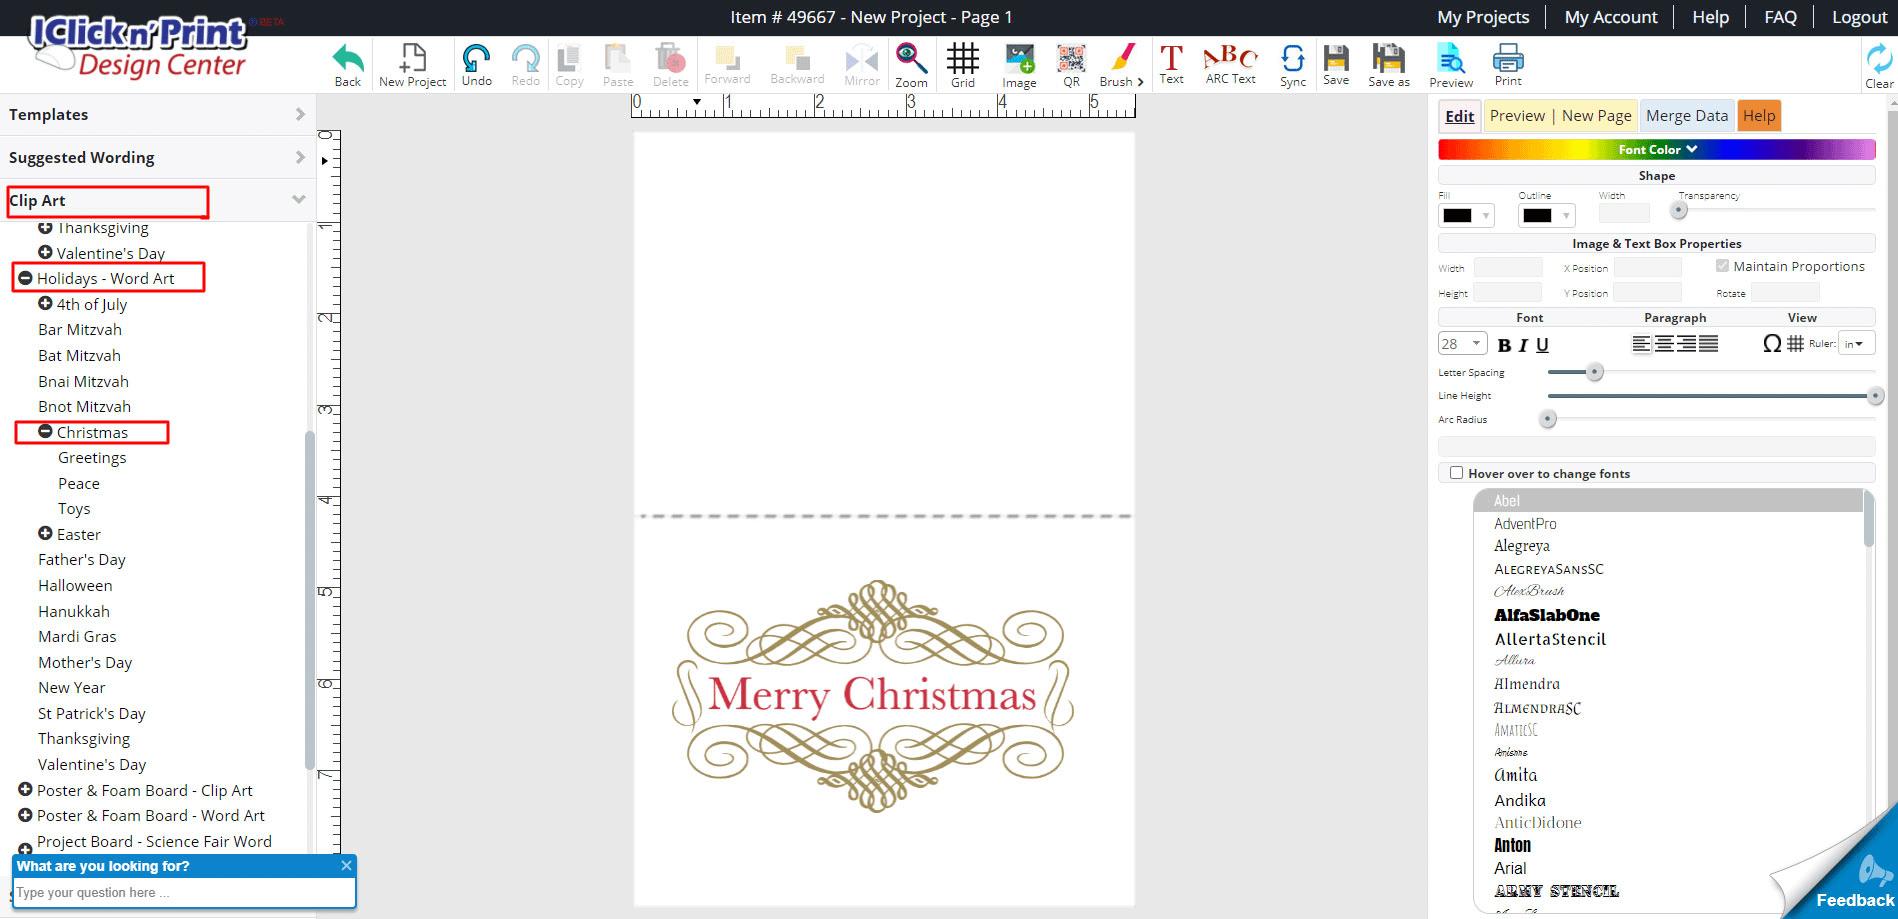 iclicknprint-Christmas-wordart-merry-christmas